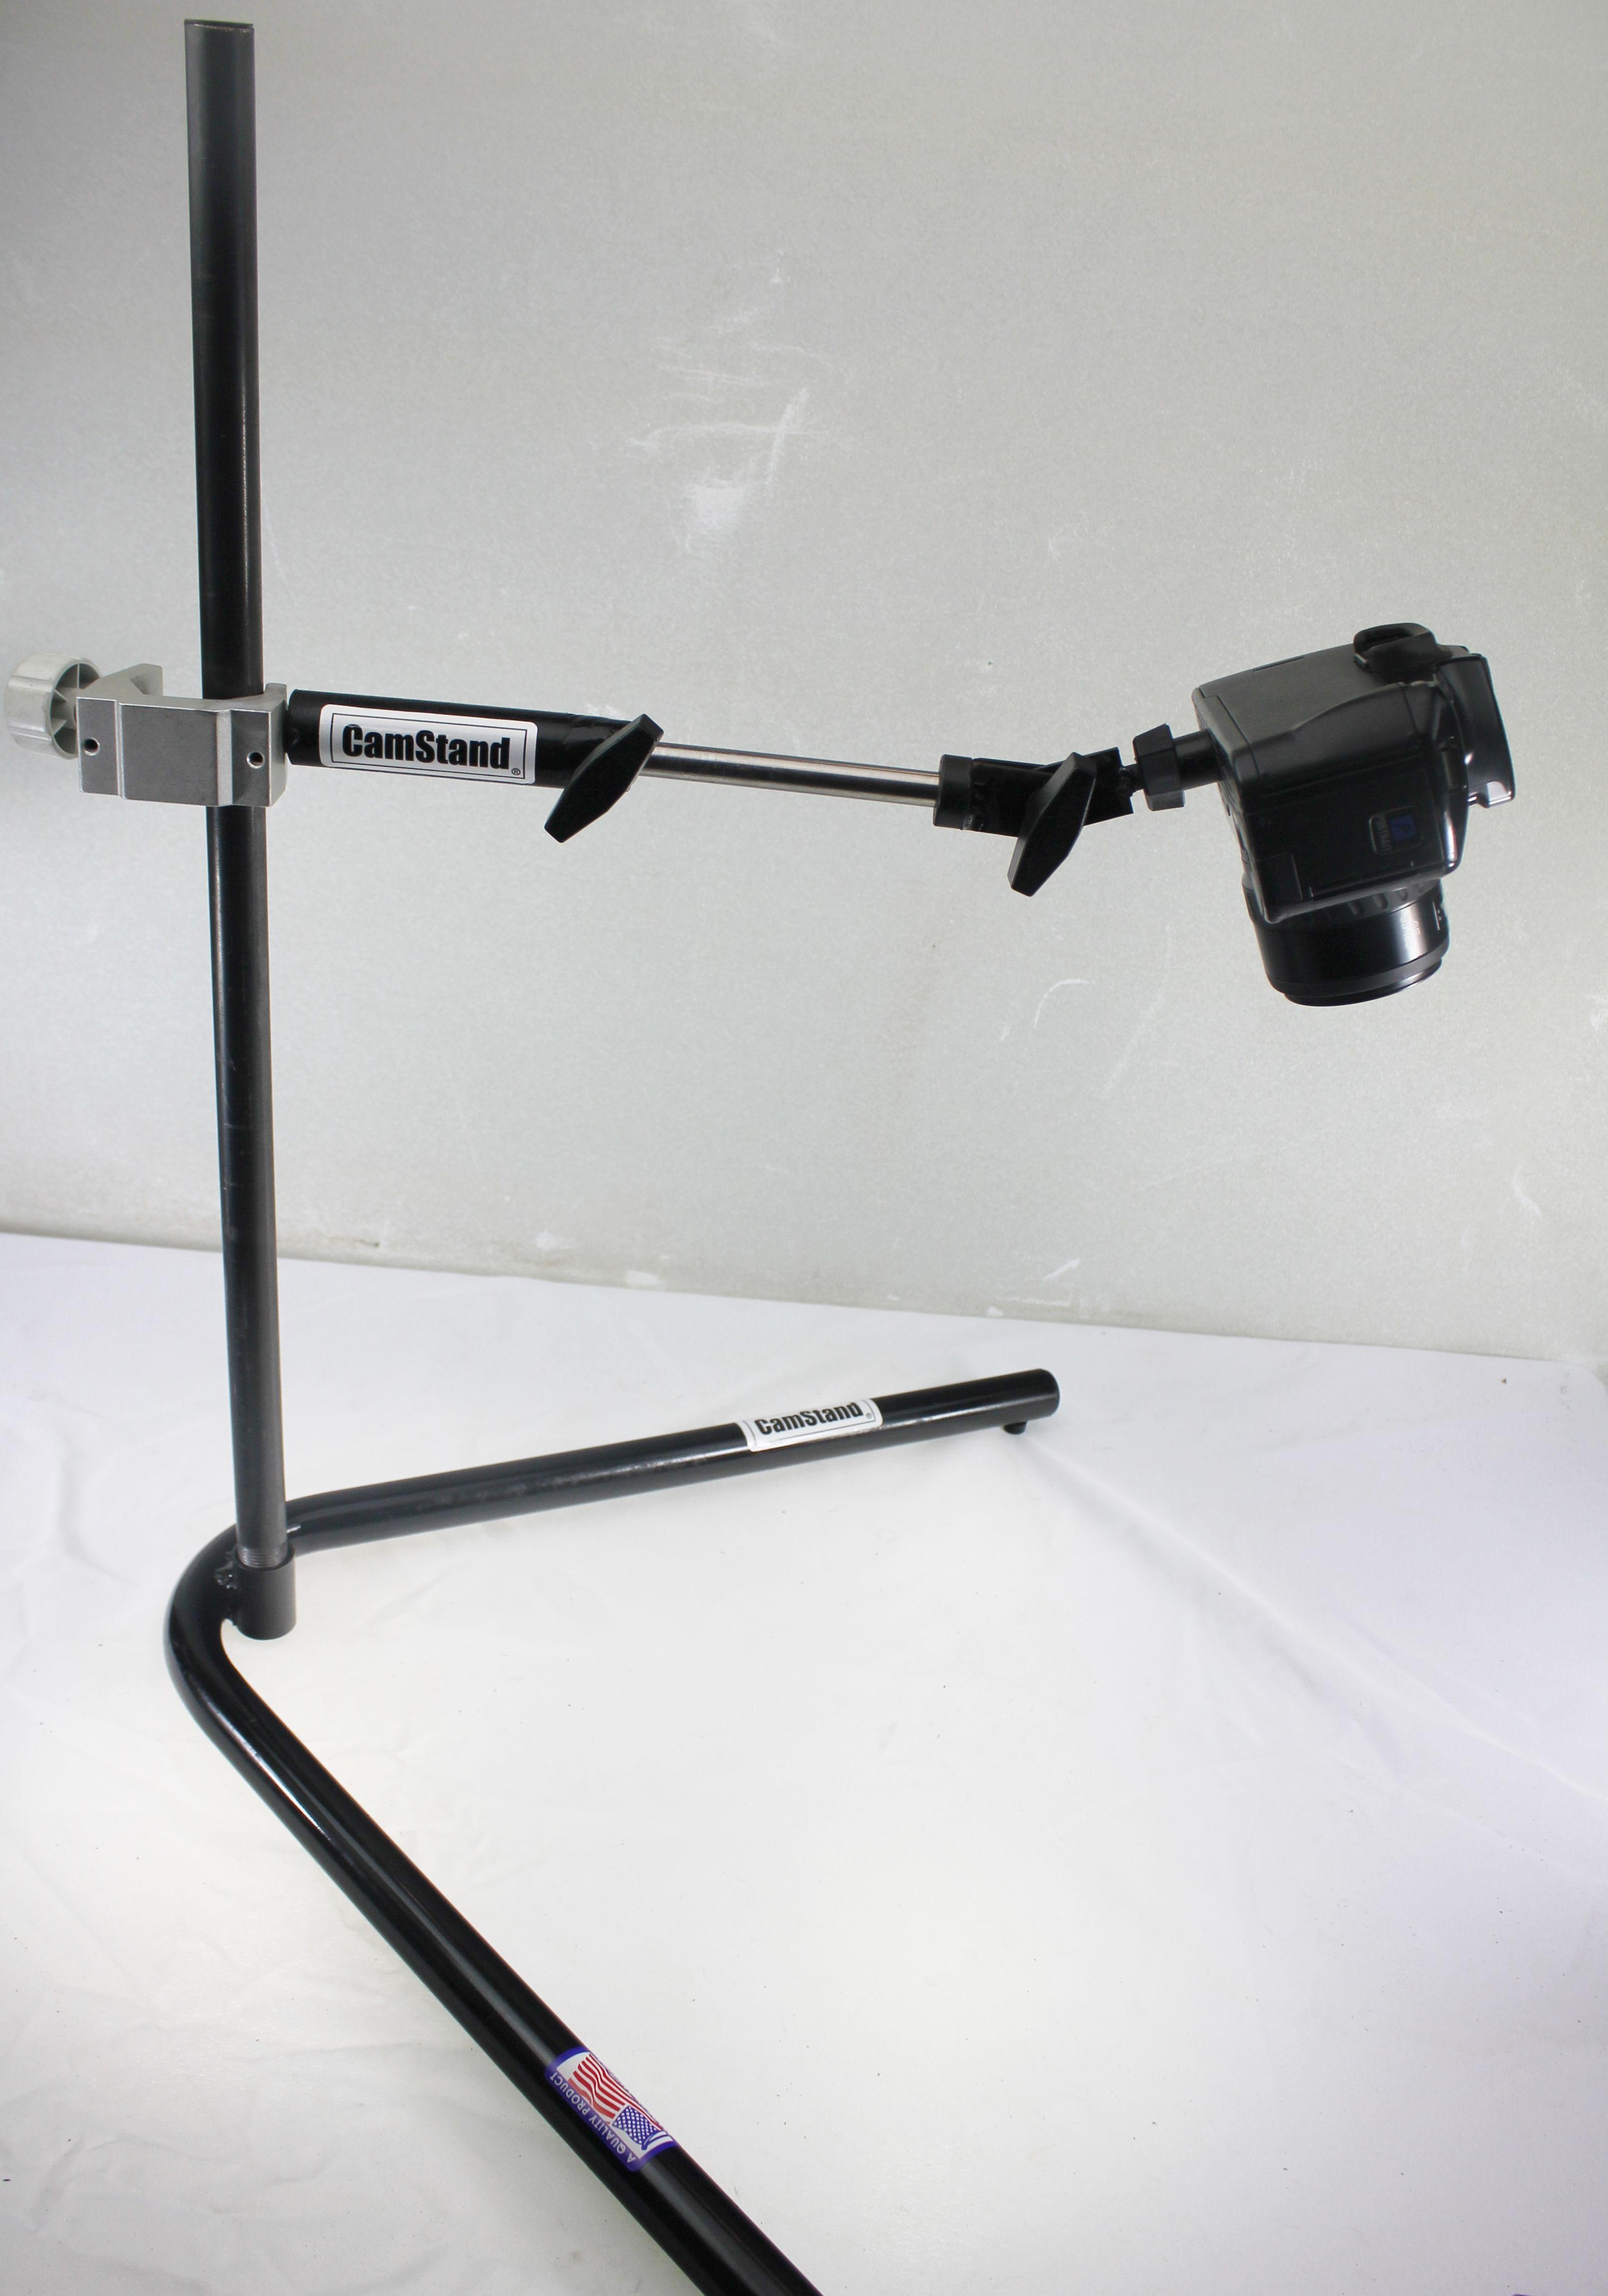 Camstand X15 Hd Camstands Desktop Camera Stands Tripod Pinterest